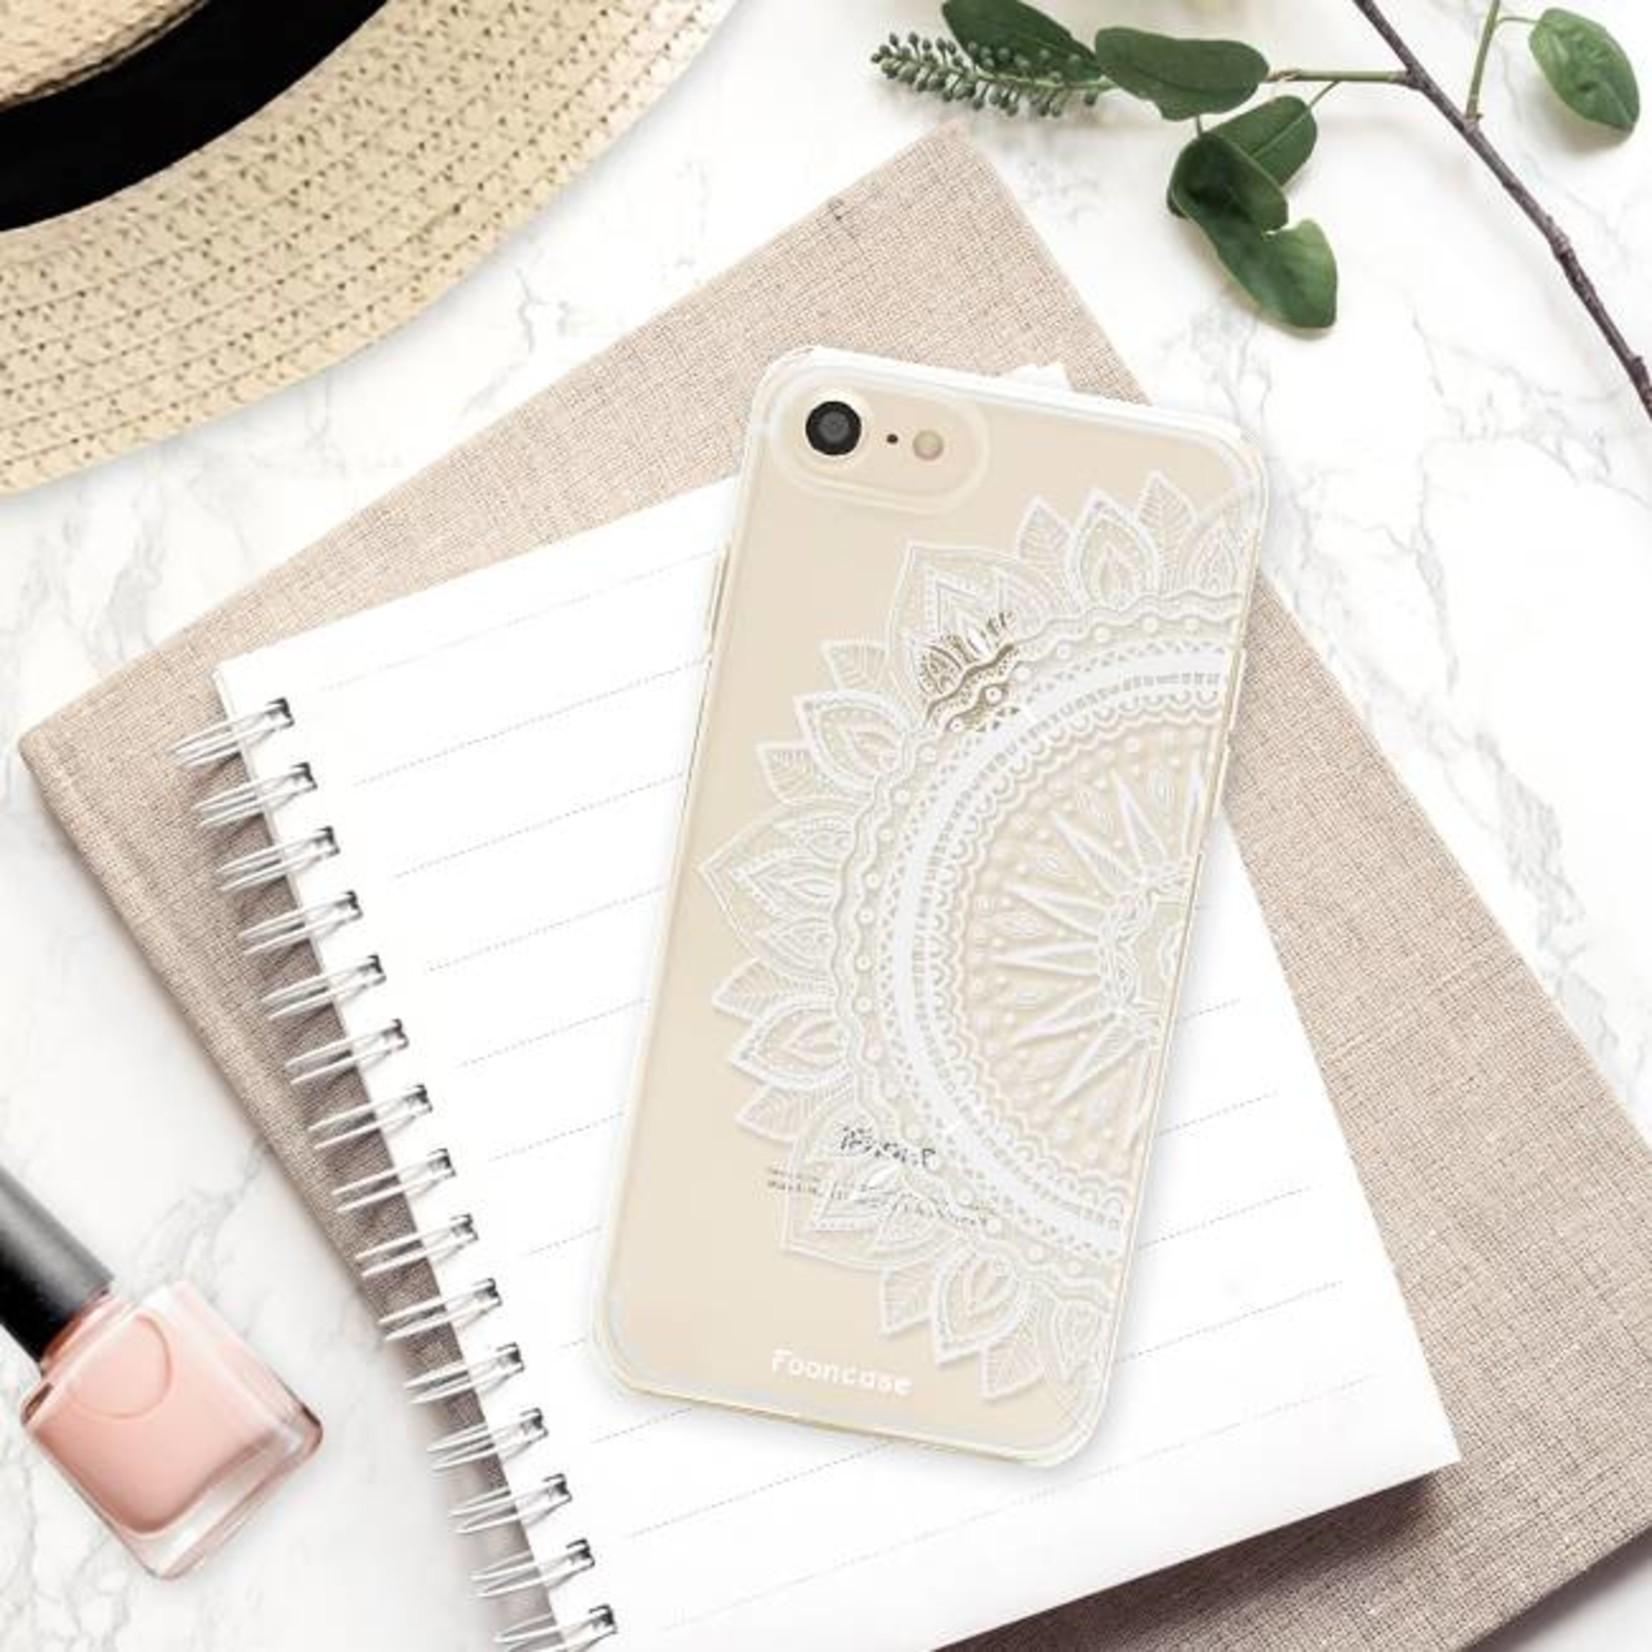 FOONCASE iPhone SE (2020) hoesje TPU Soft Case - Back Cover - Mandala / Ibiza